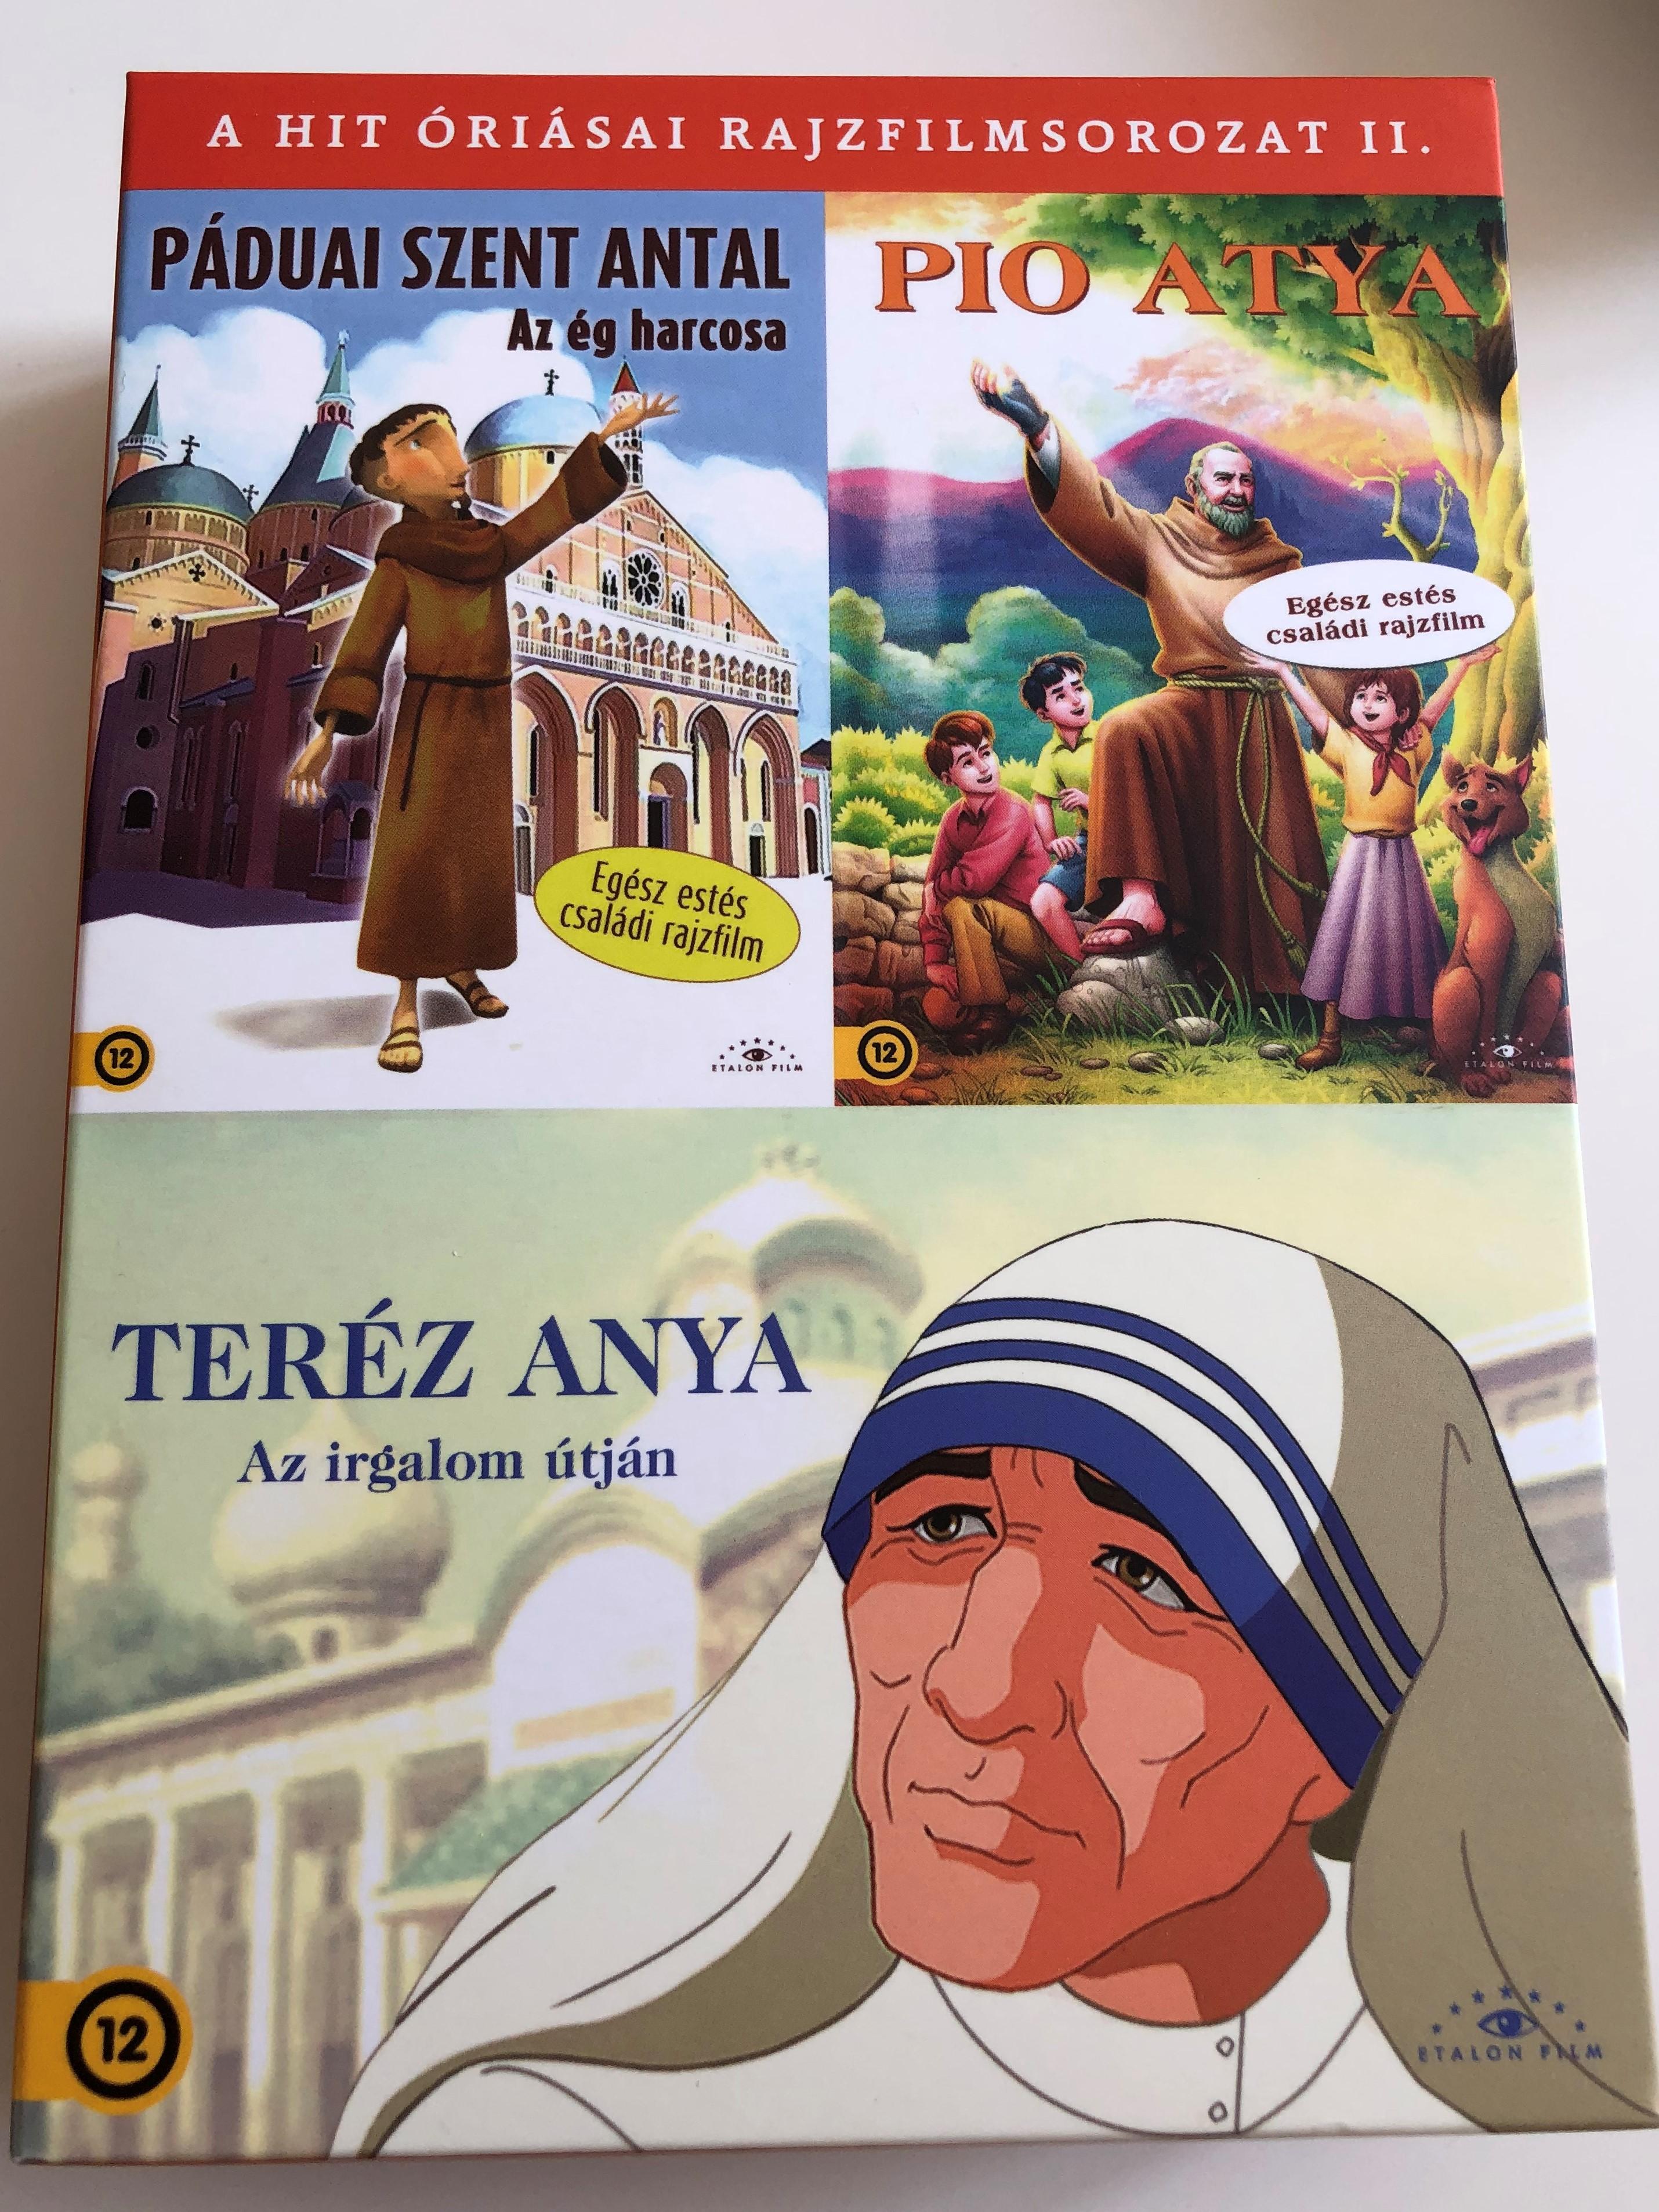 p-duai-szent-antal-pio-atya-ter-z-anya-dvd-a-hit-ri-sai-rajzfilmsorozat-ii-3-disc-dvd-box-three-family-cartoons-synchronised-to-hungarian-language-1-.jpg